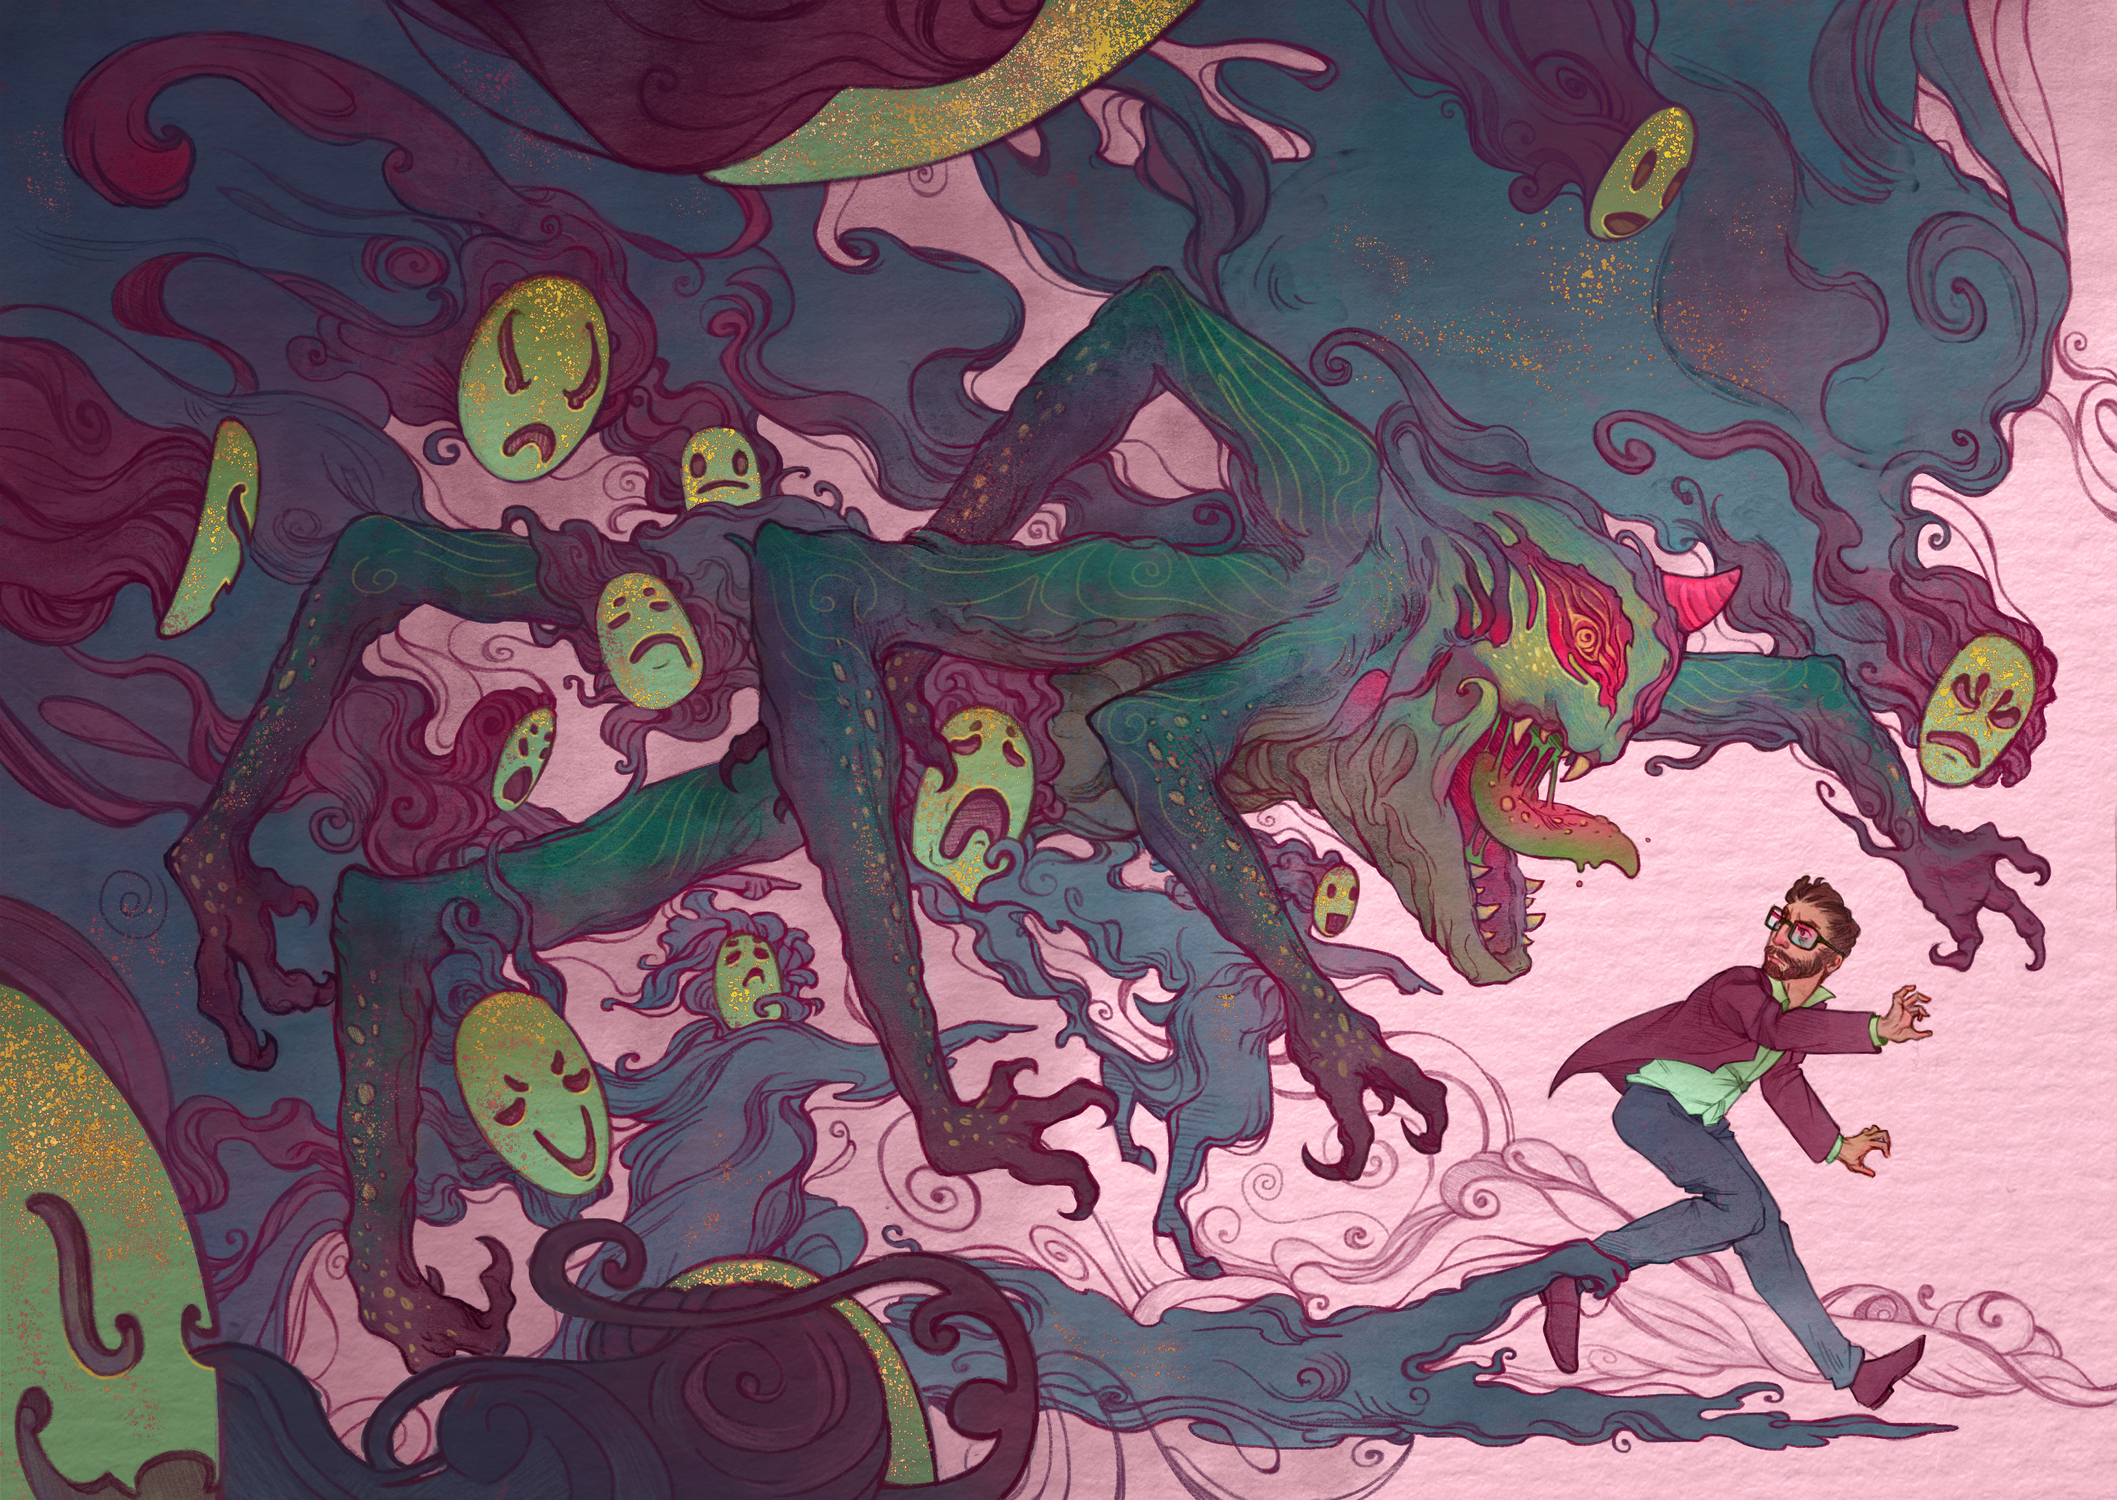 Demons Artwork by Michelle Lockamy